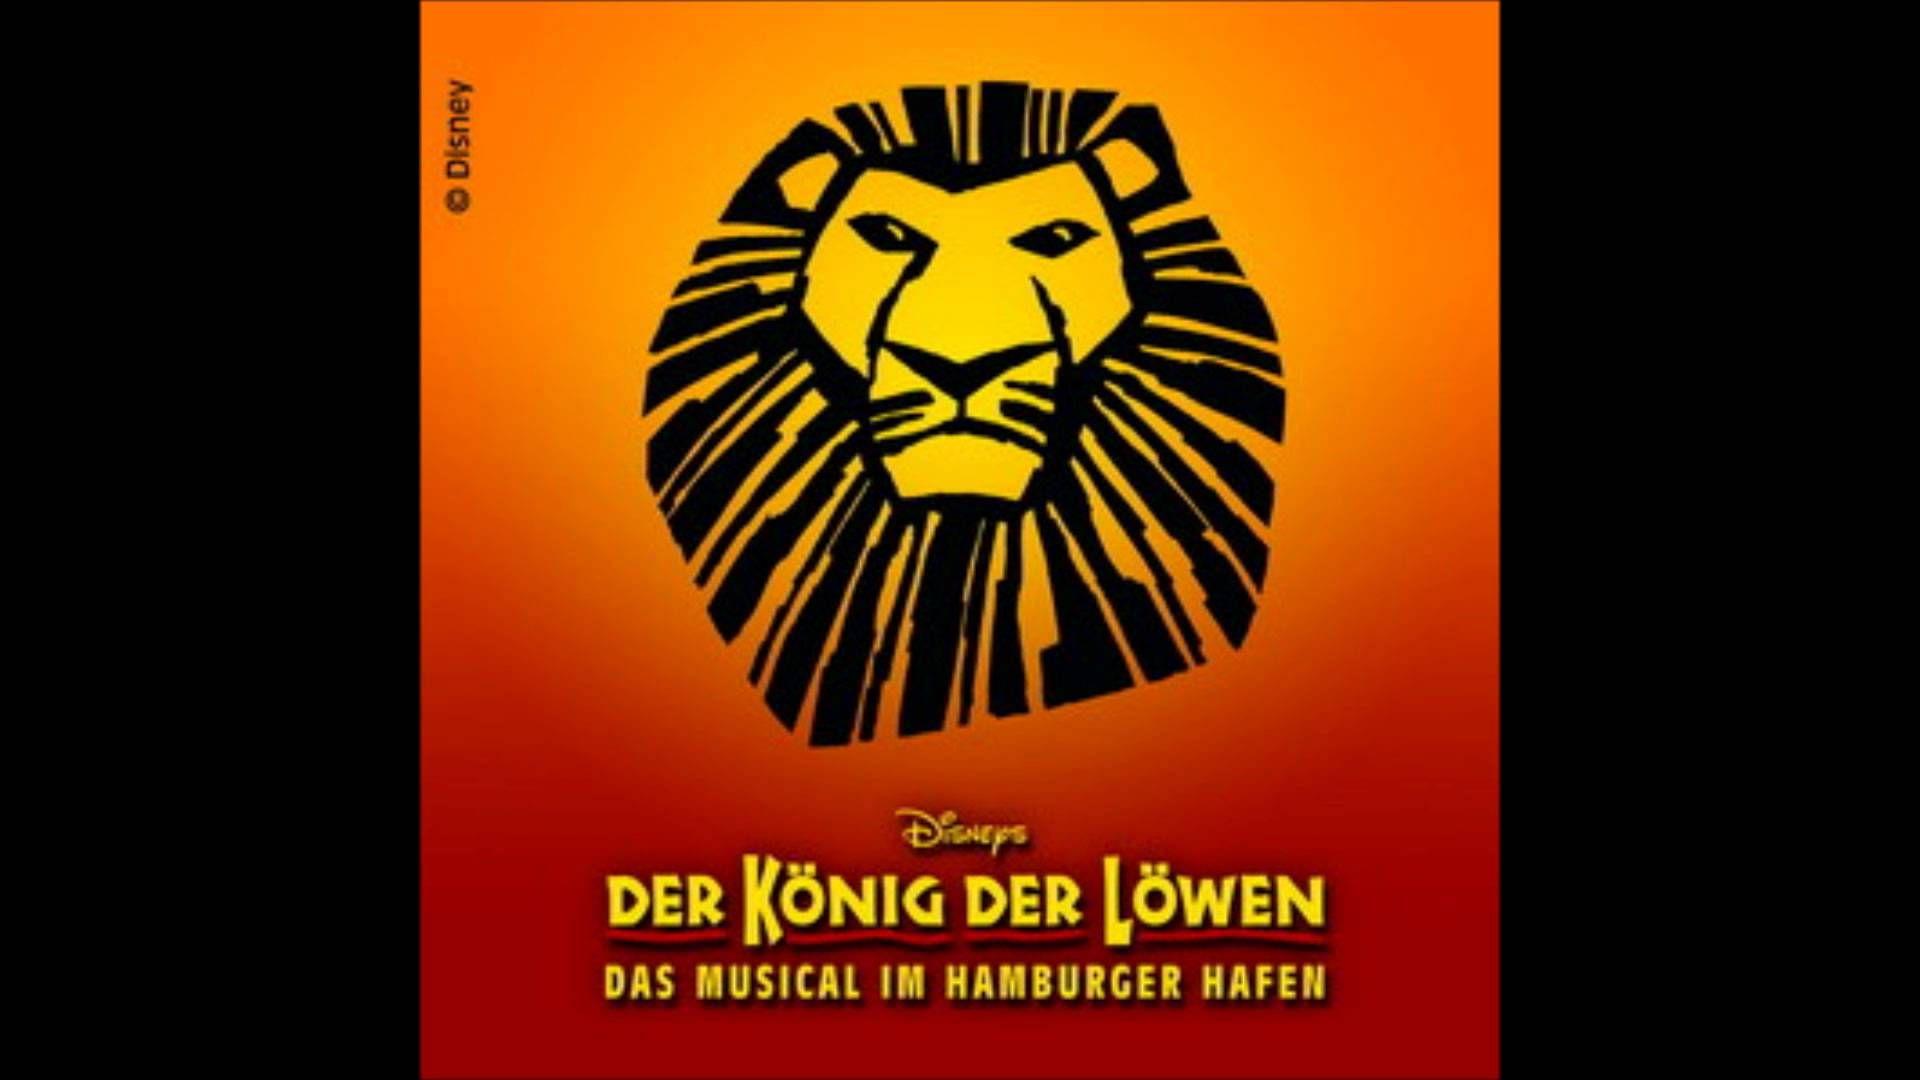 König der Löwen- Er lebt in dir (Musical) Lion king